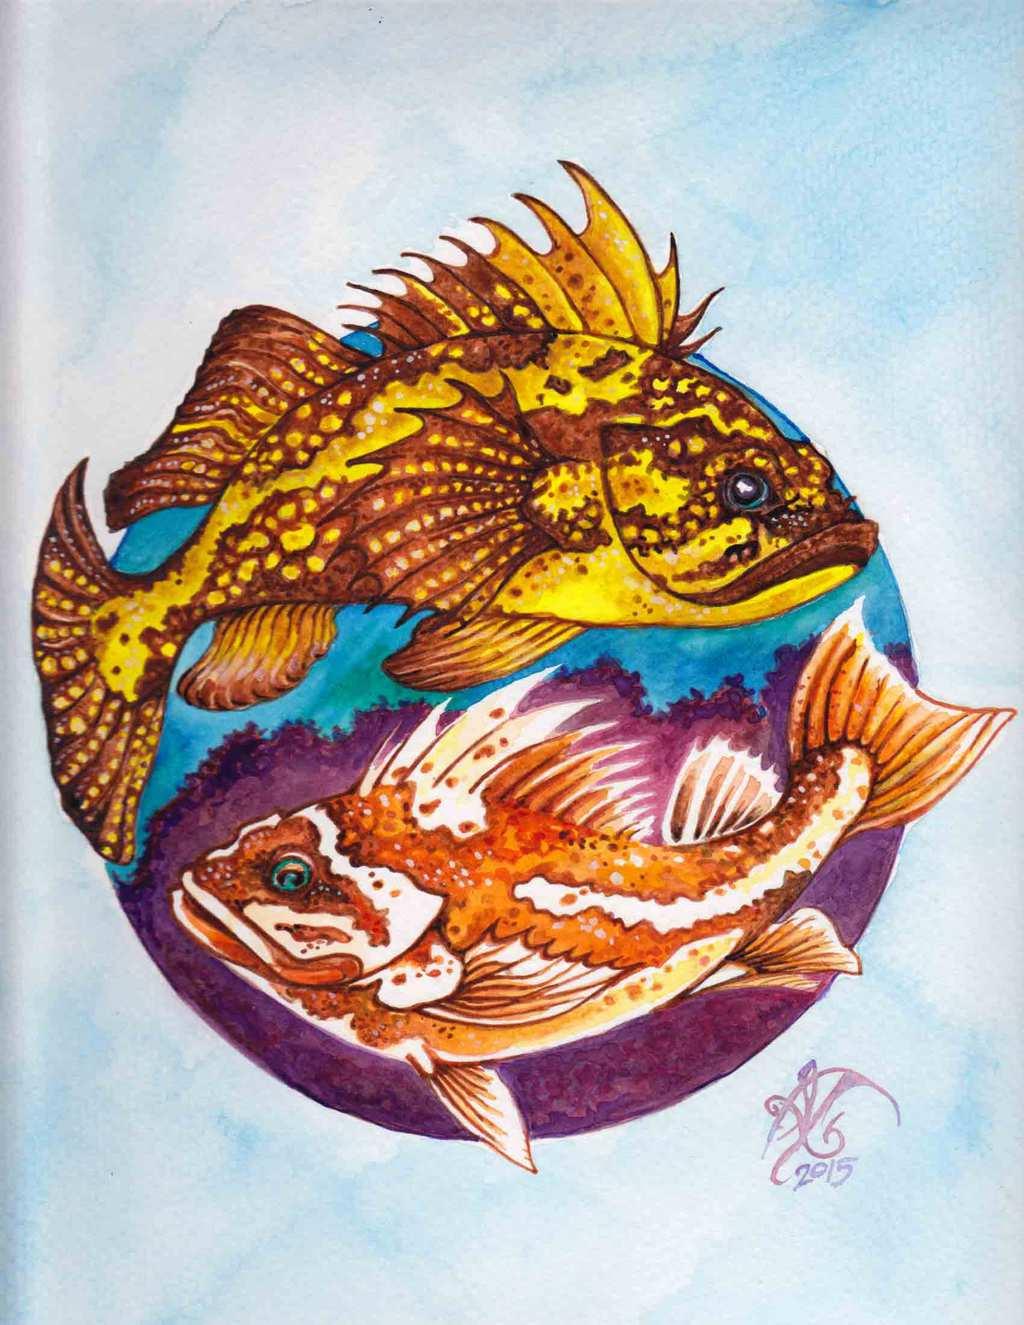 China Rockfish, Copper Rockfish